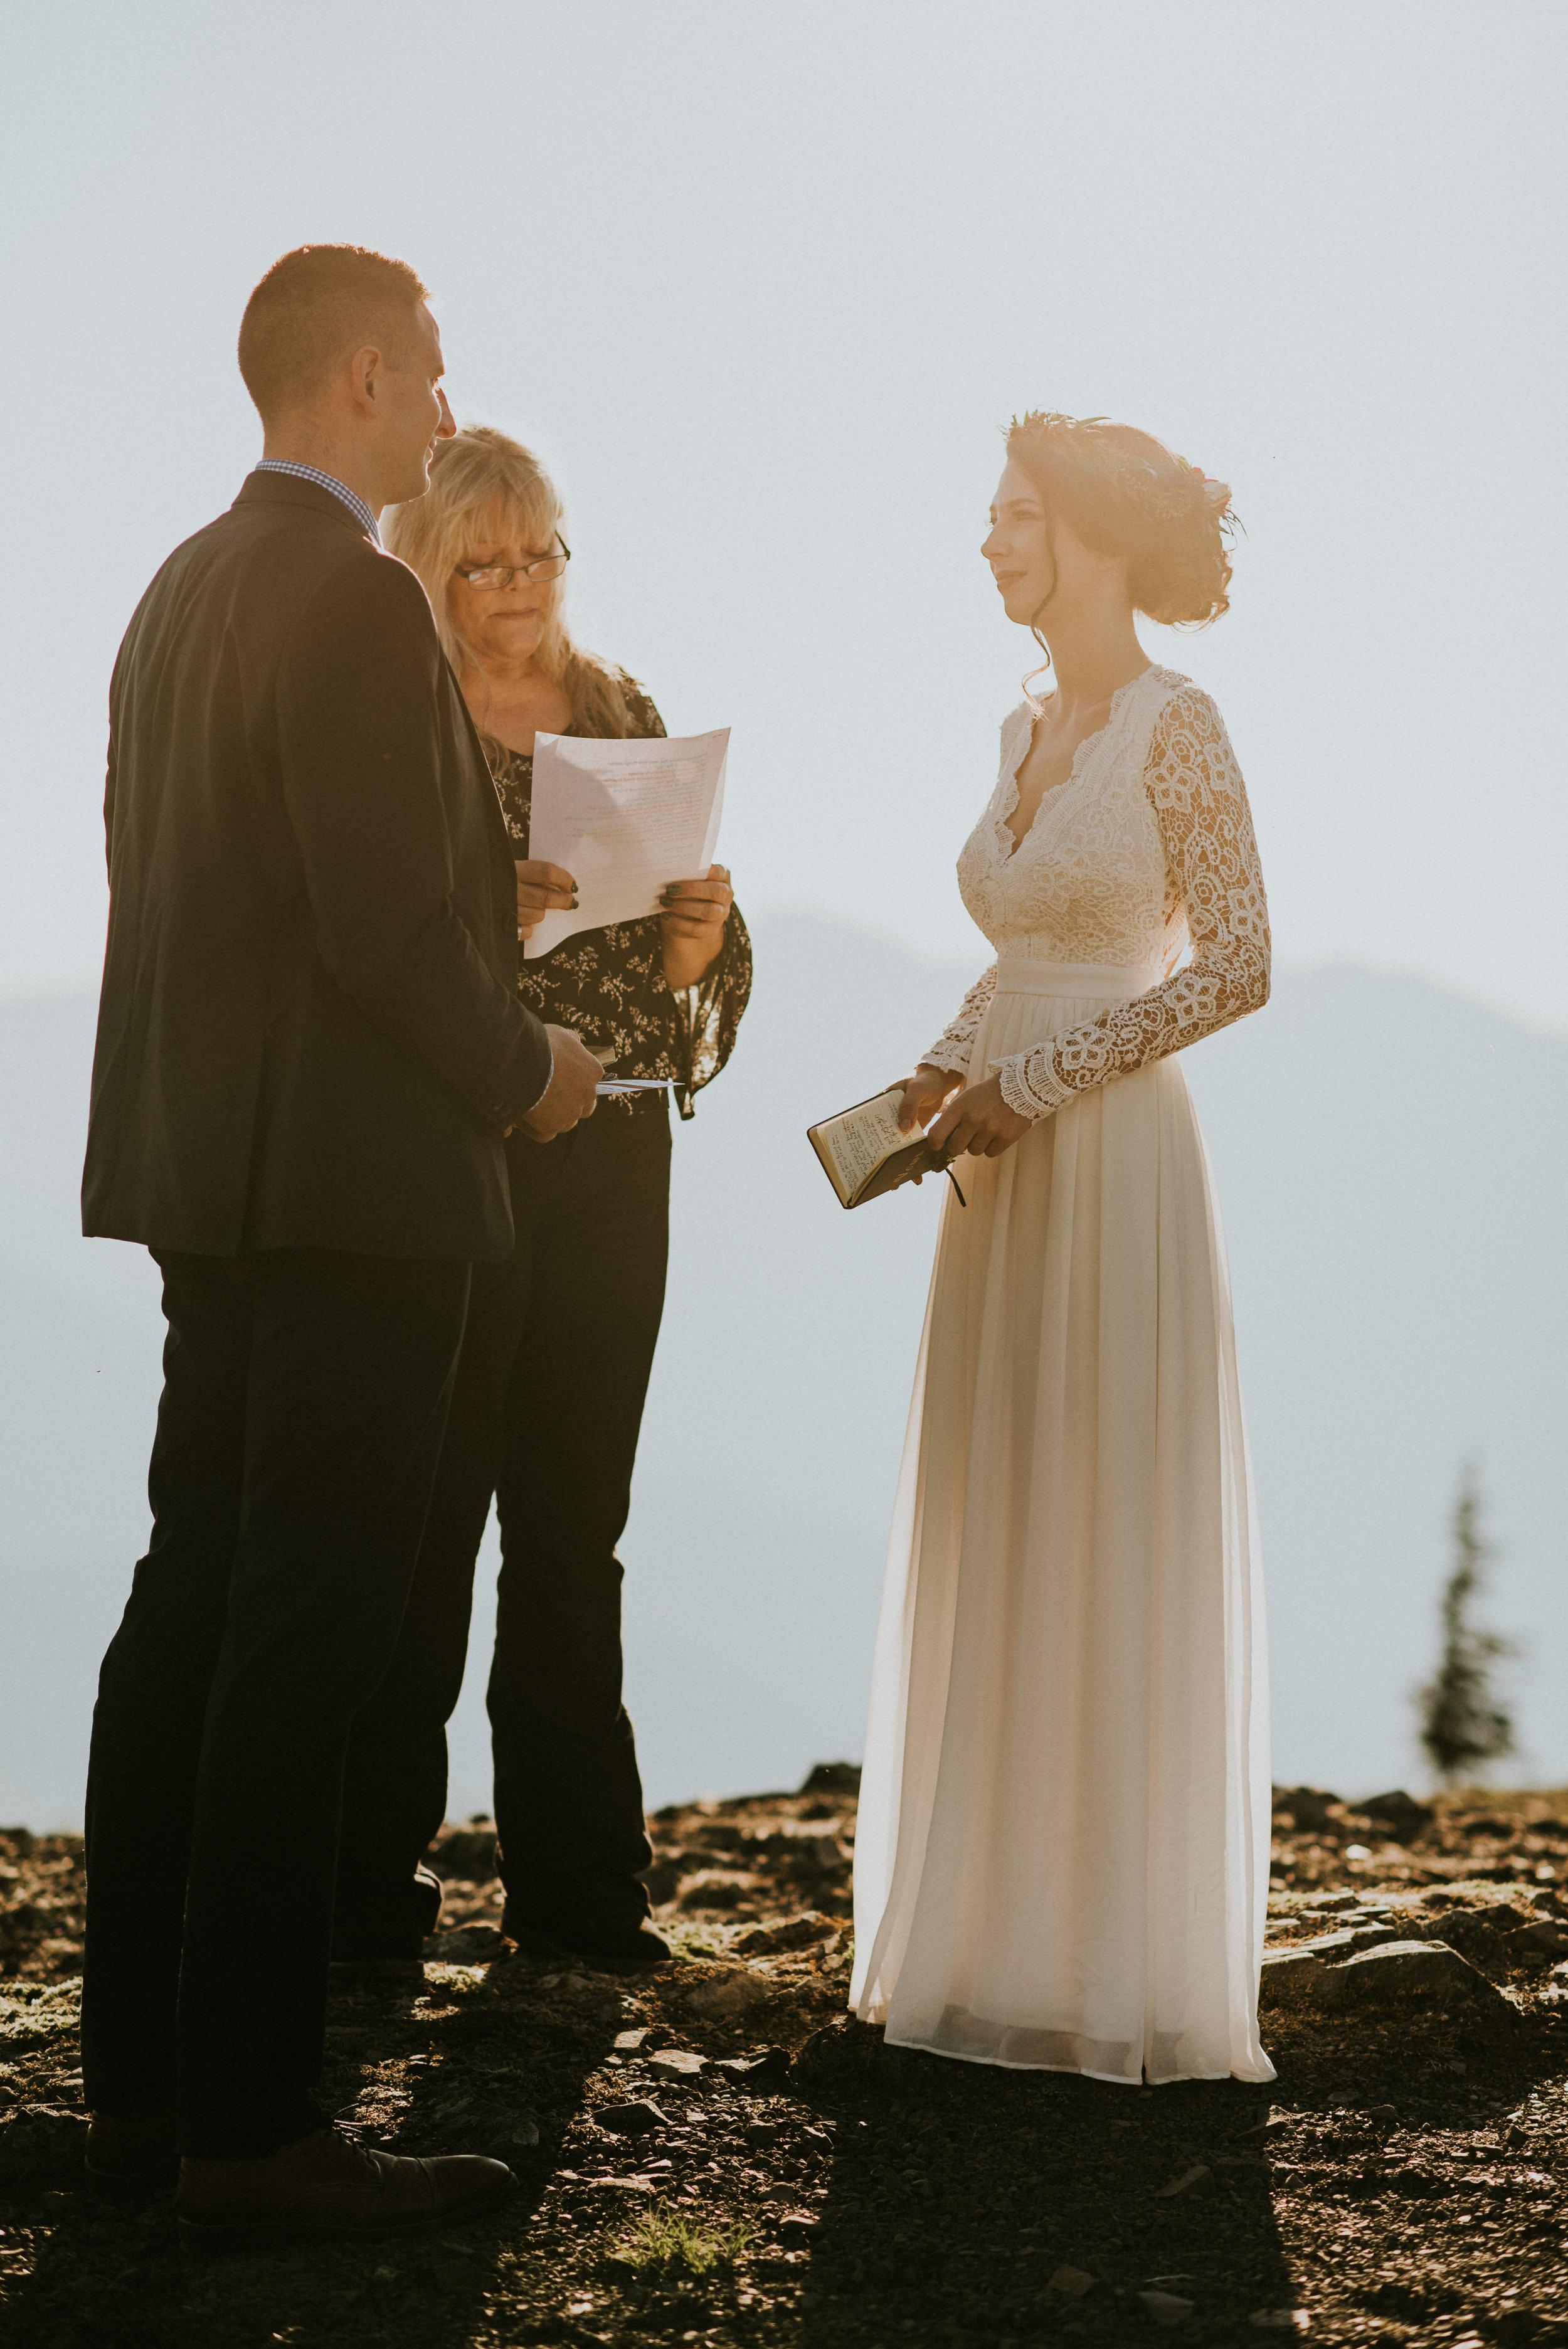 Alaina + Jared - Olympic National Park Elopement - Kamra Fuller Photography-100.jpg